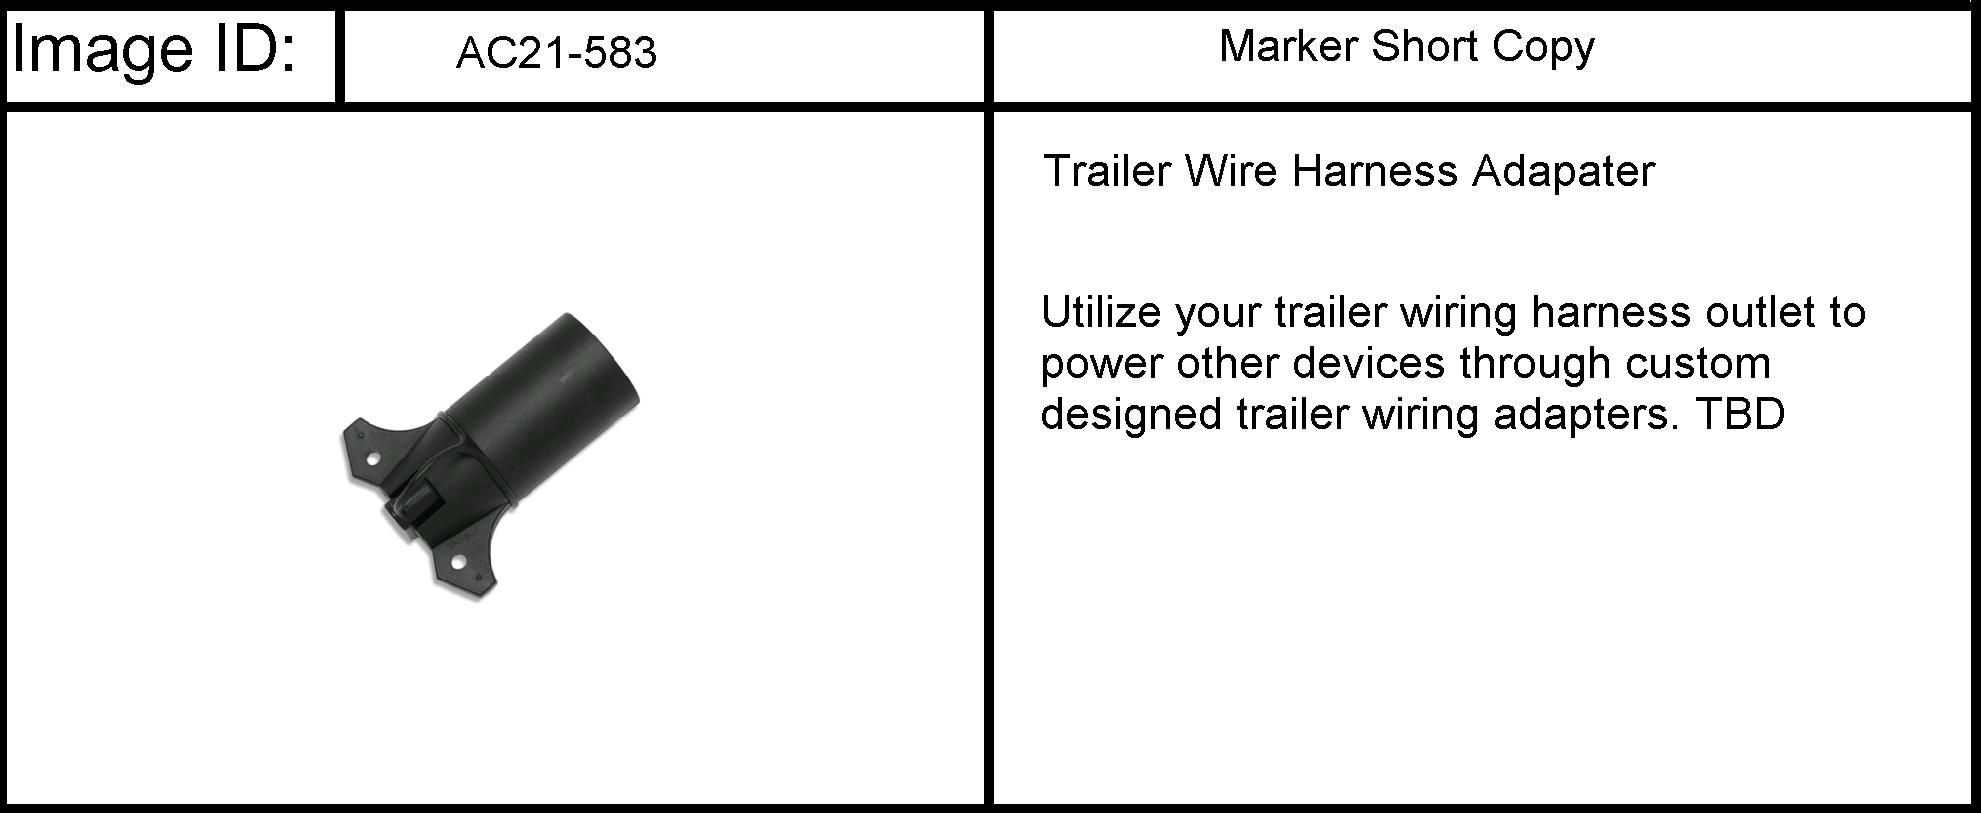 Gmc Acadia Awd Rv1 Paq Adaptador Arns Ratr De 7 Trailer Wiring Harness Recambios Autos Epc